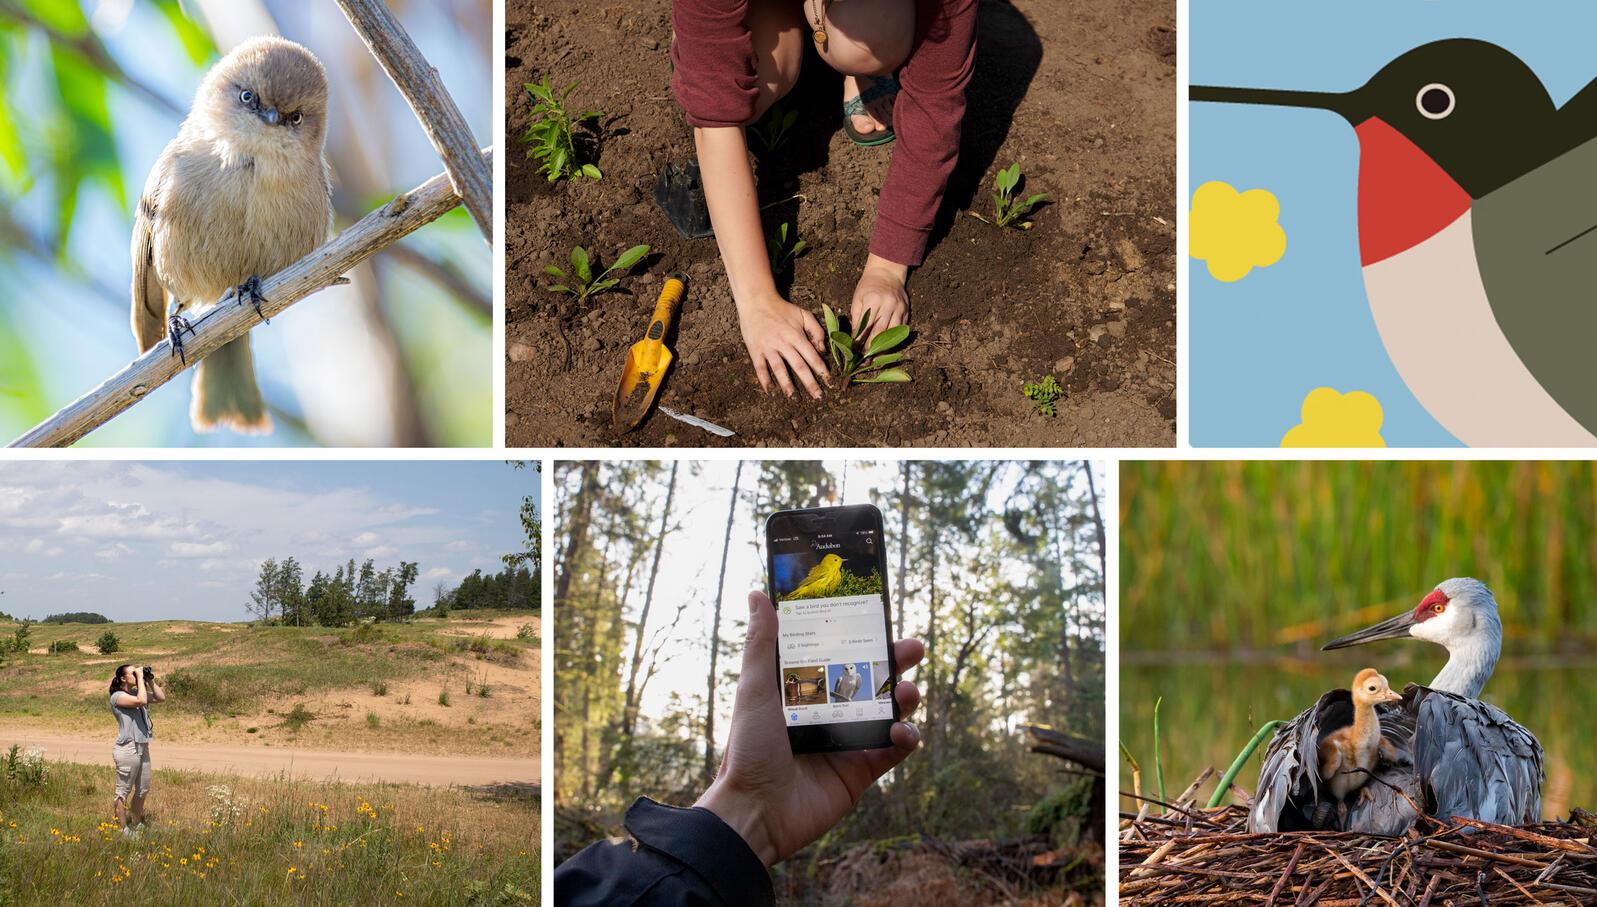 Photos/Illustration clockwise from top left: Devin Grady/Audubon Photography Awards; Bridget Bennett; Alex Tomlinson; Mary Lundeberg/Audubon Photography Awards; Luke Franke/Audubon; Camilla Cerea/Audubon